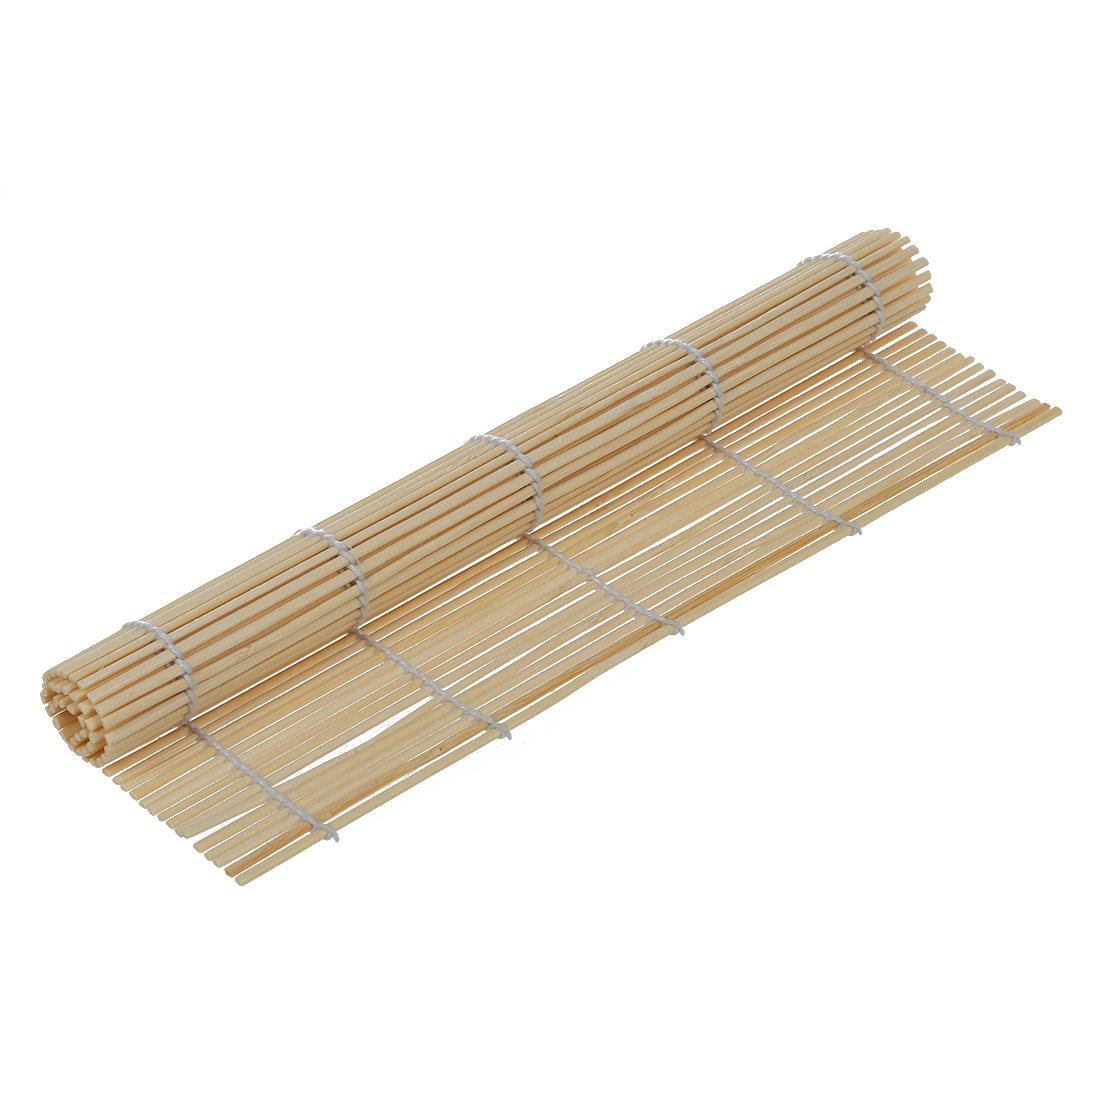 Mat Sushi-TOOGOO(R) Japanese SUSHI MAT BAMBOO Roll Mat Pad JAPANESE KITCHEN 23cm x 24cm